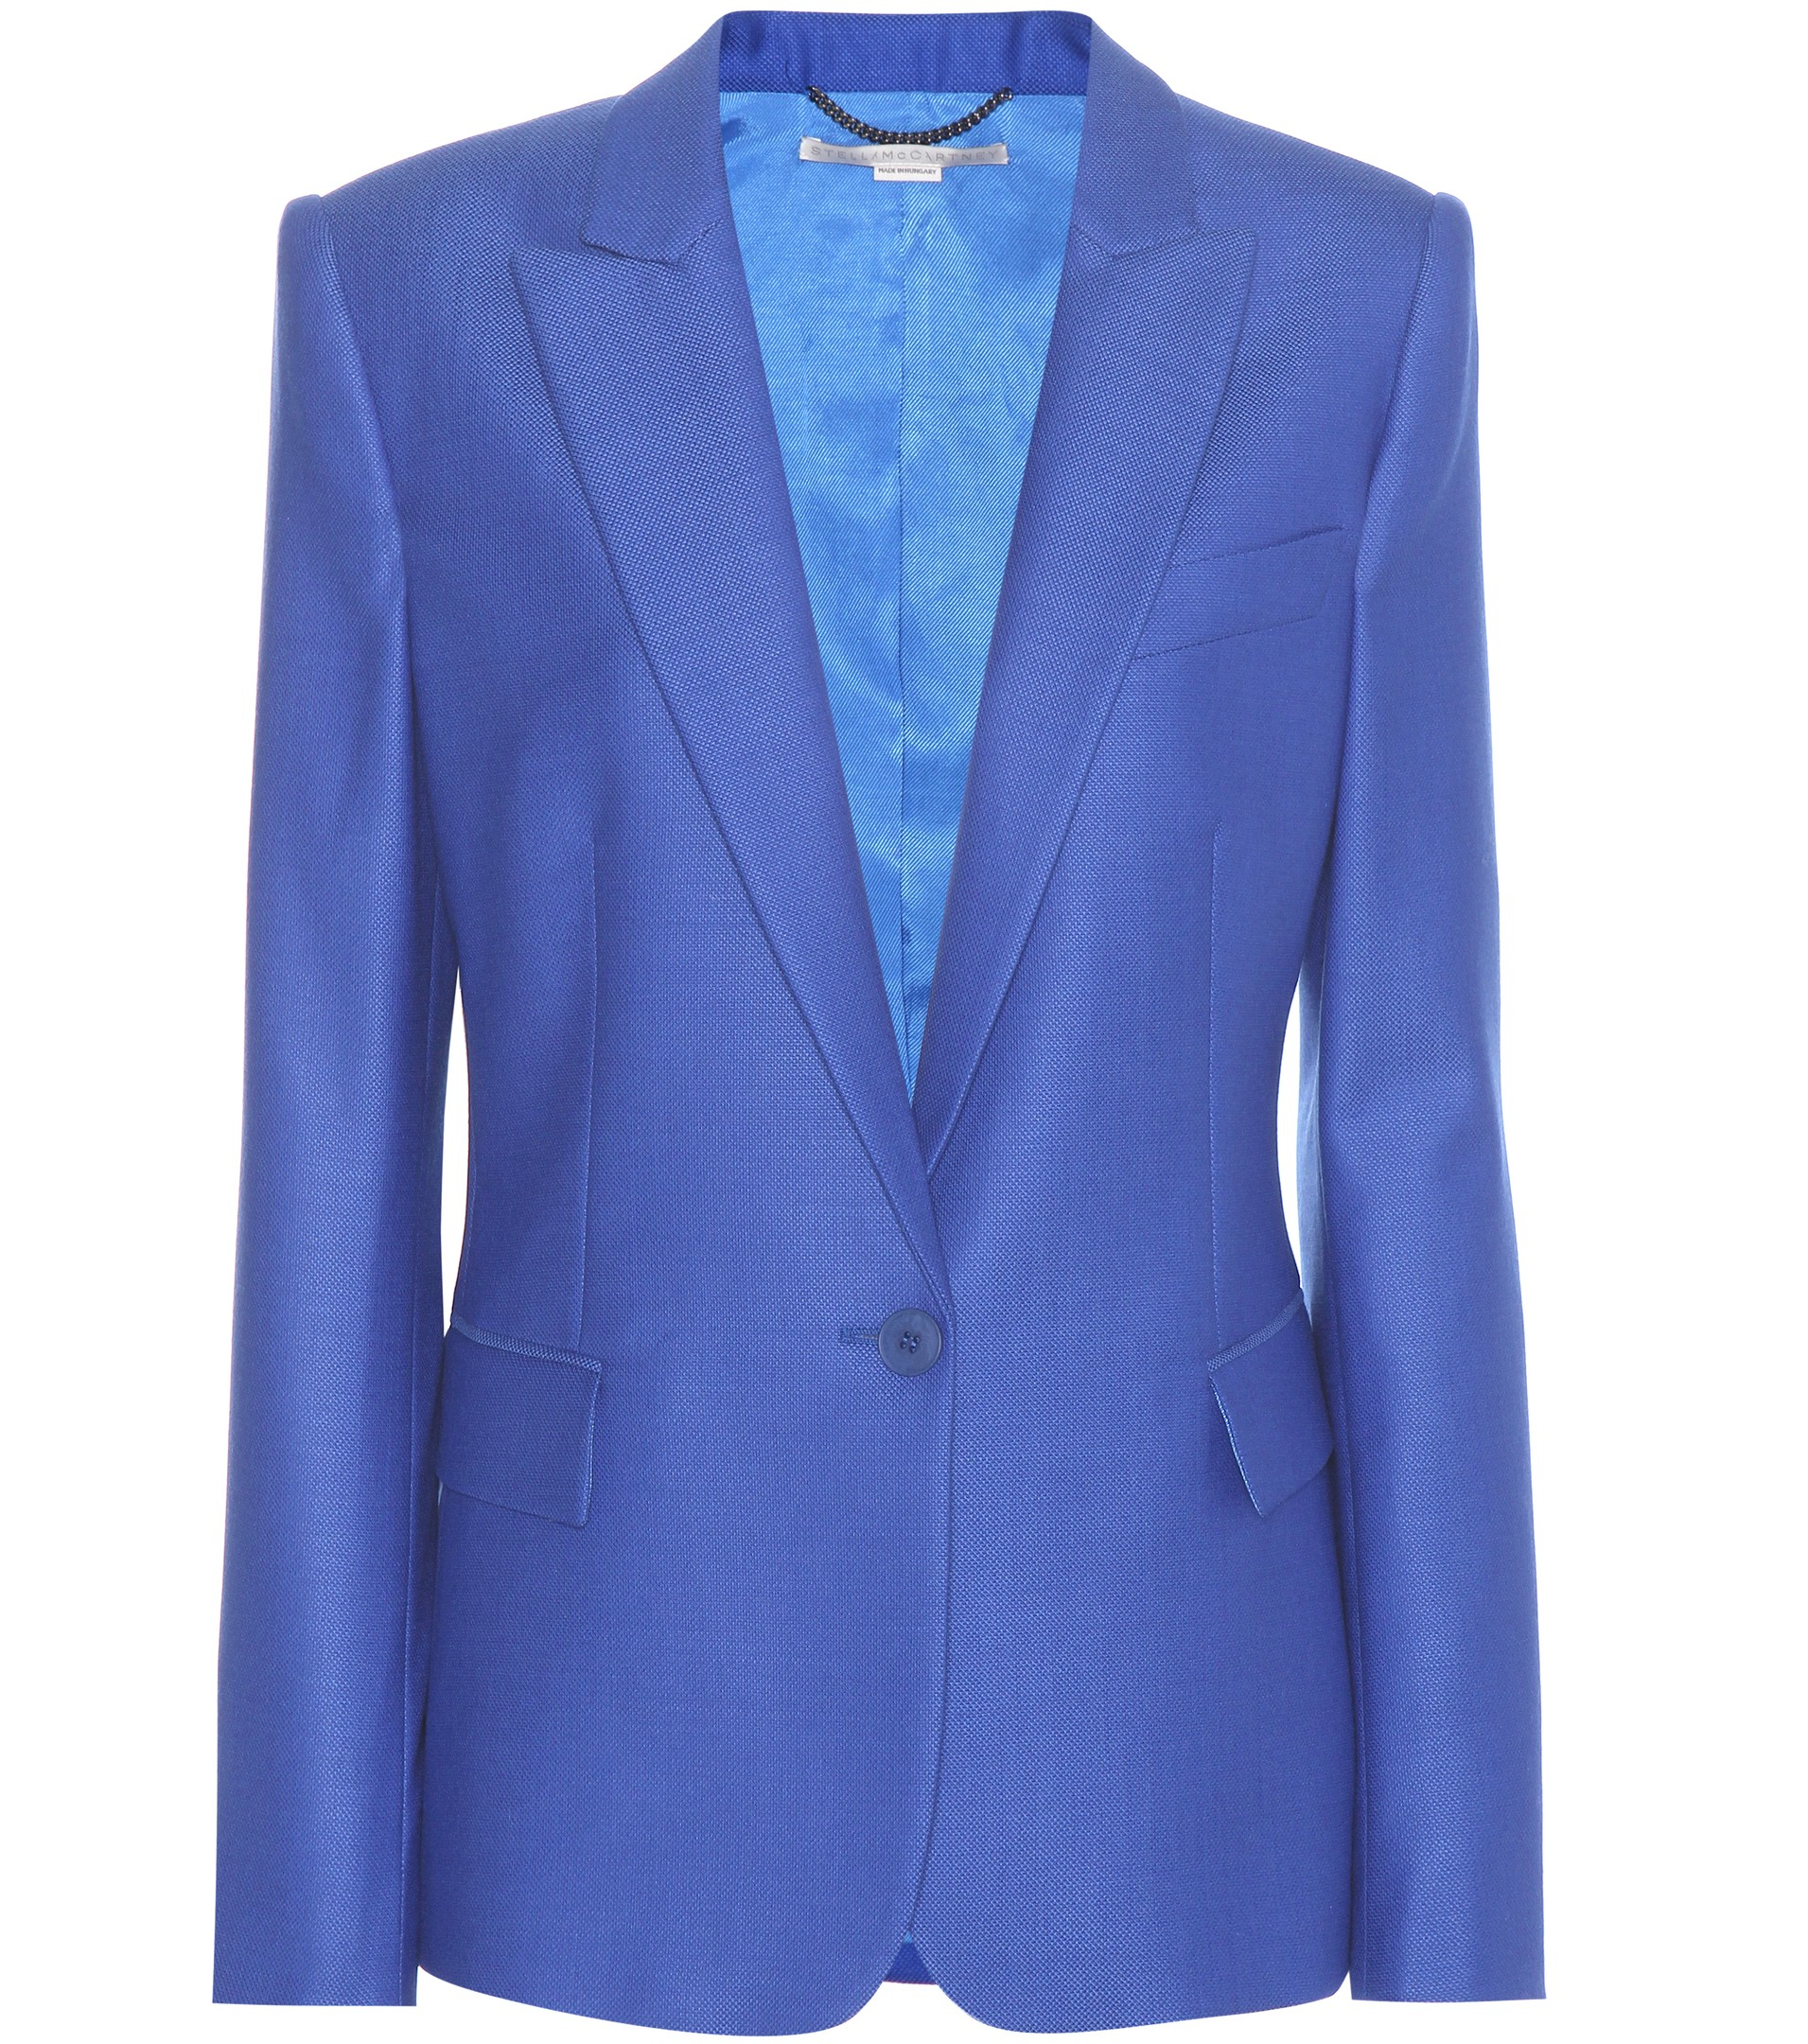 Cornflower blue Stella McCartney Ingrid wool blazer blue Stella McCartney blazer